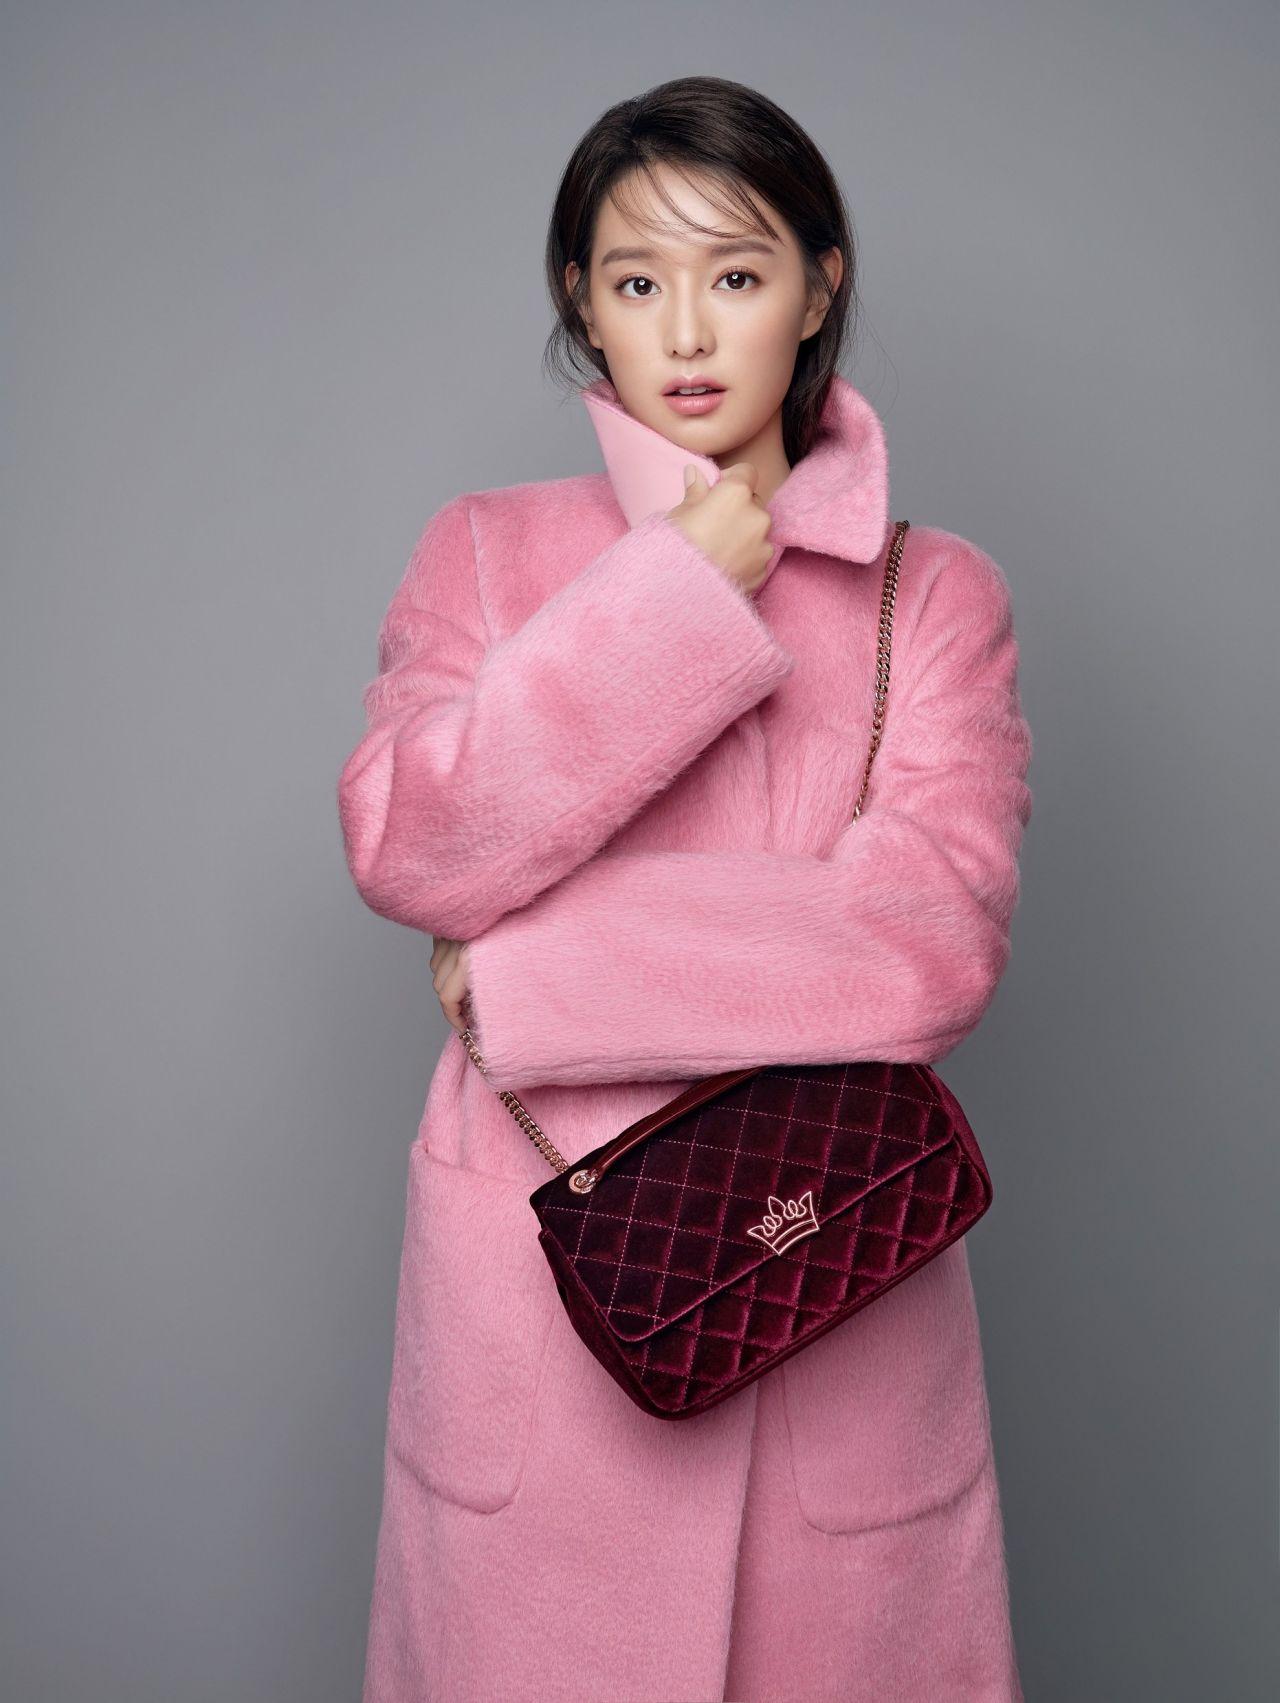 Kim Ji Won Photoshoot For J Estina Handbags Fall Winter 2017